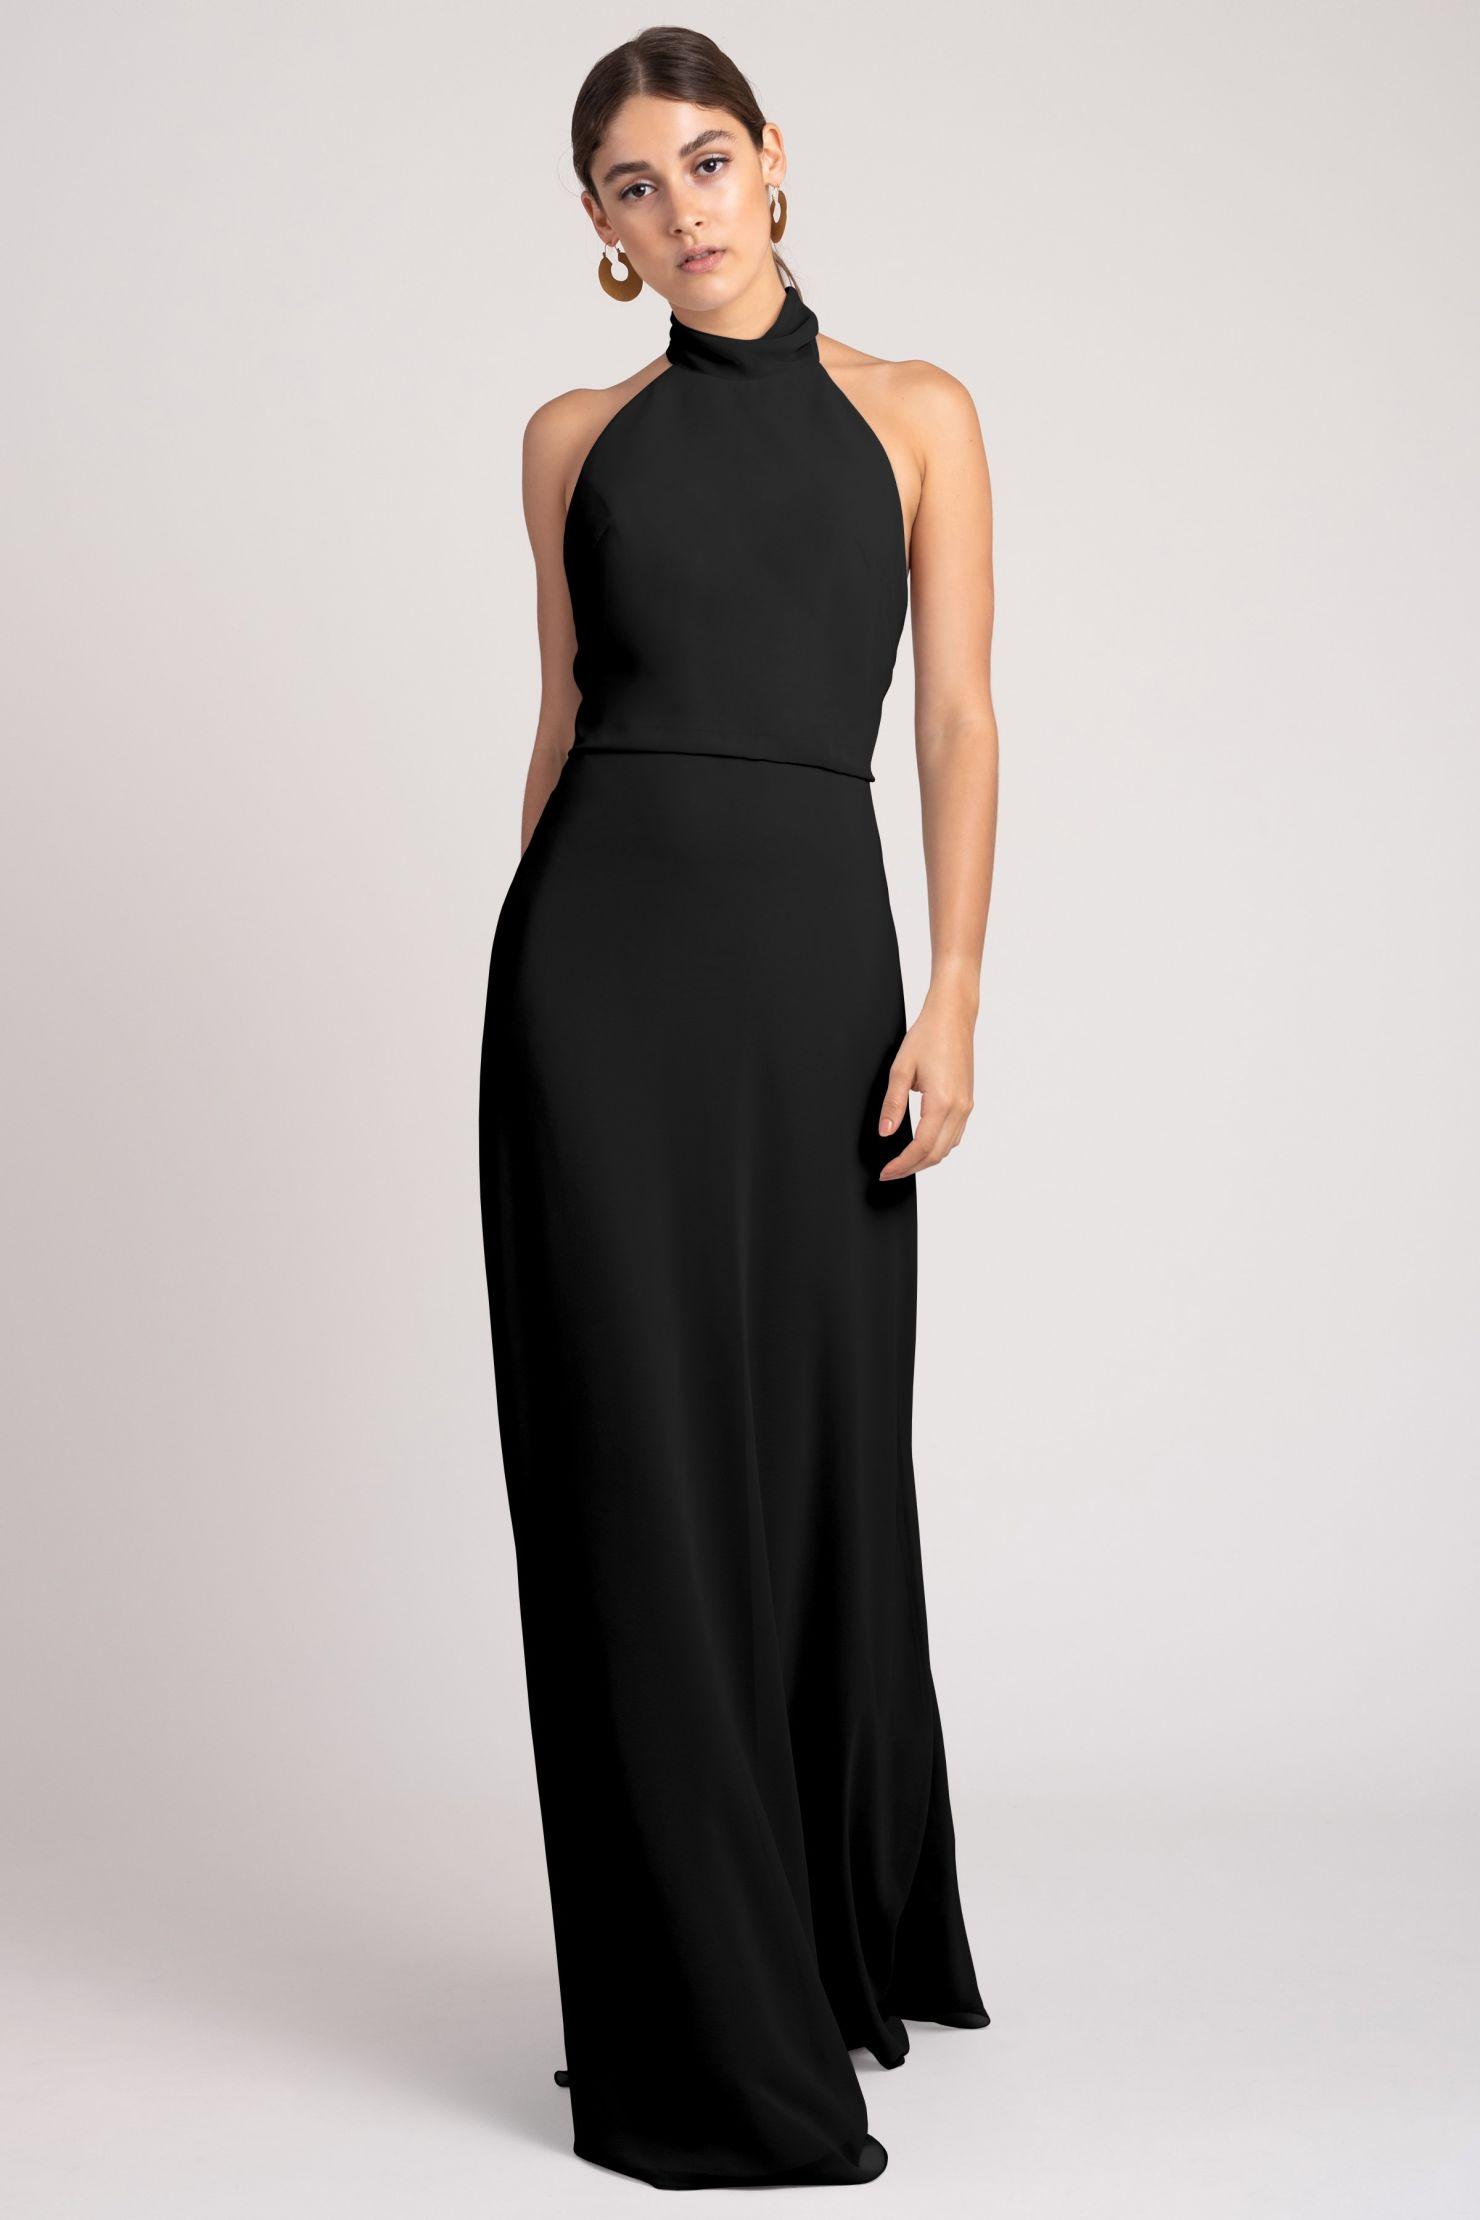 Brett Bridesmaids Dress by Jenny Yoo - Black